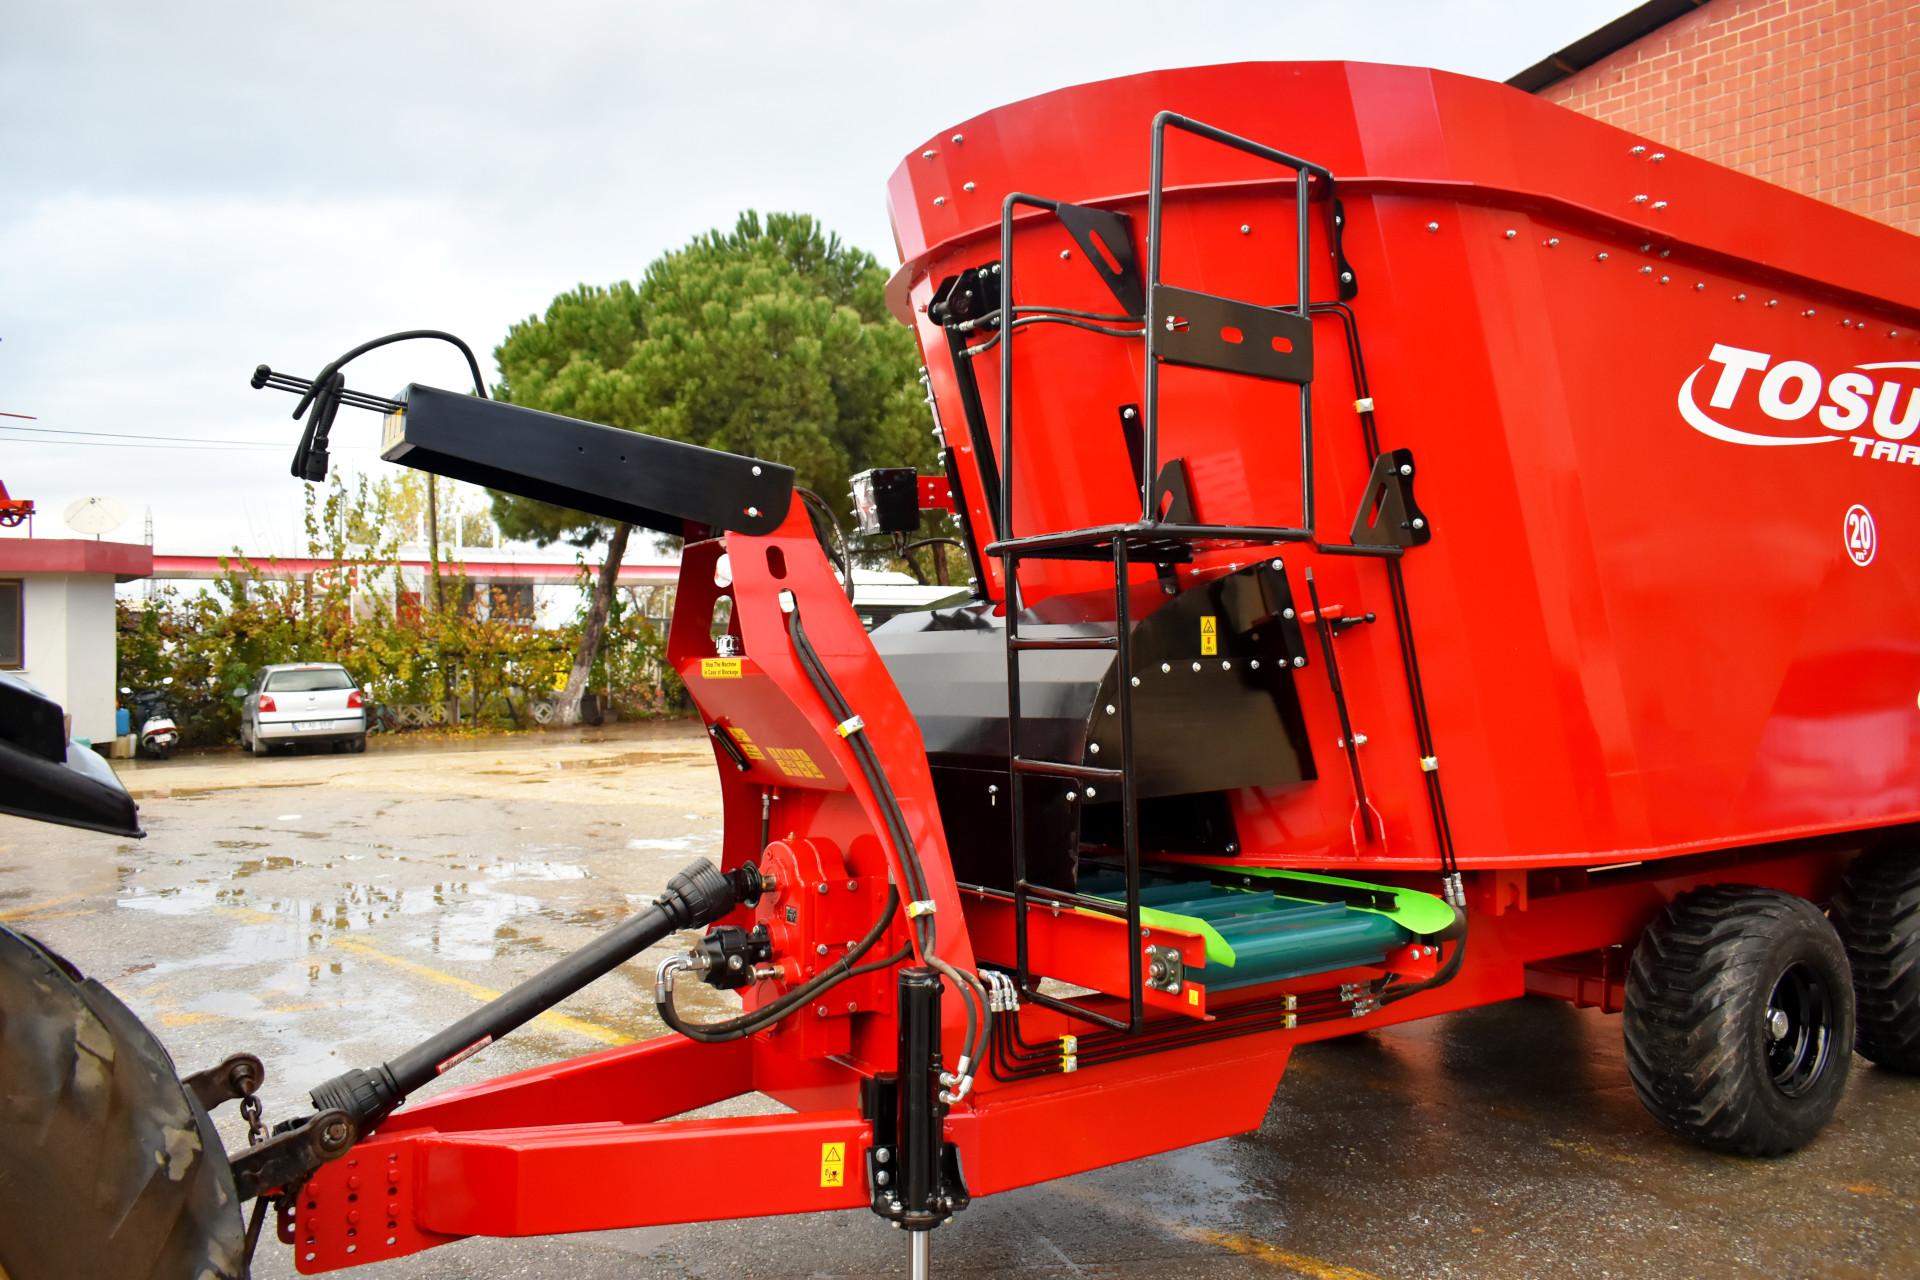 Vertical Feed Mixer 20 m3 - Tosun Farm Machines Izmir